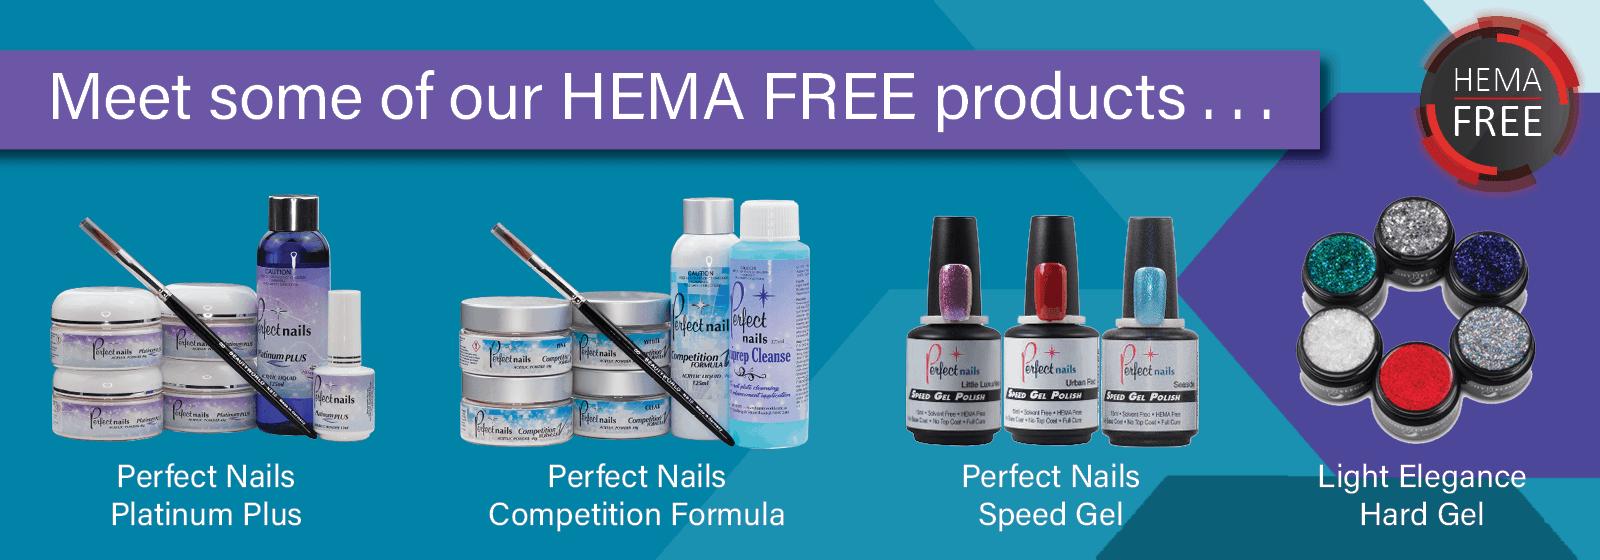 HEMA free - Home Page